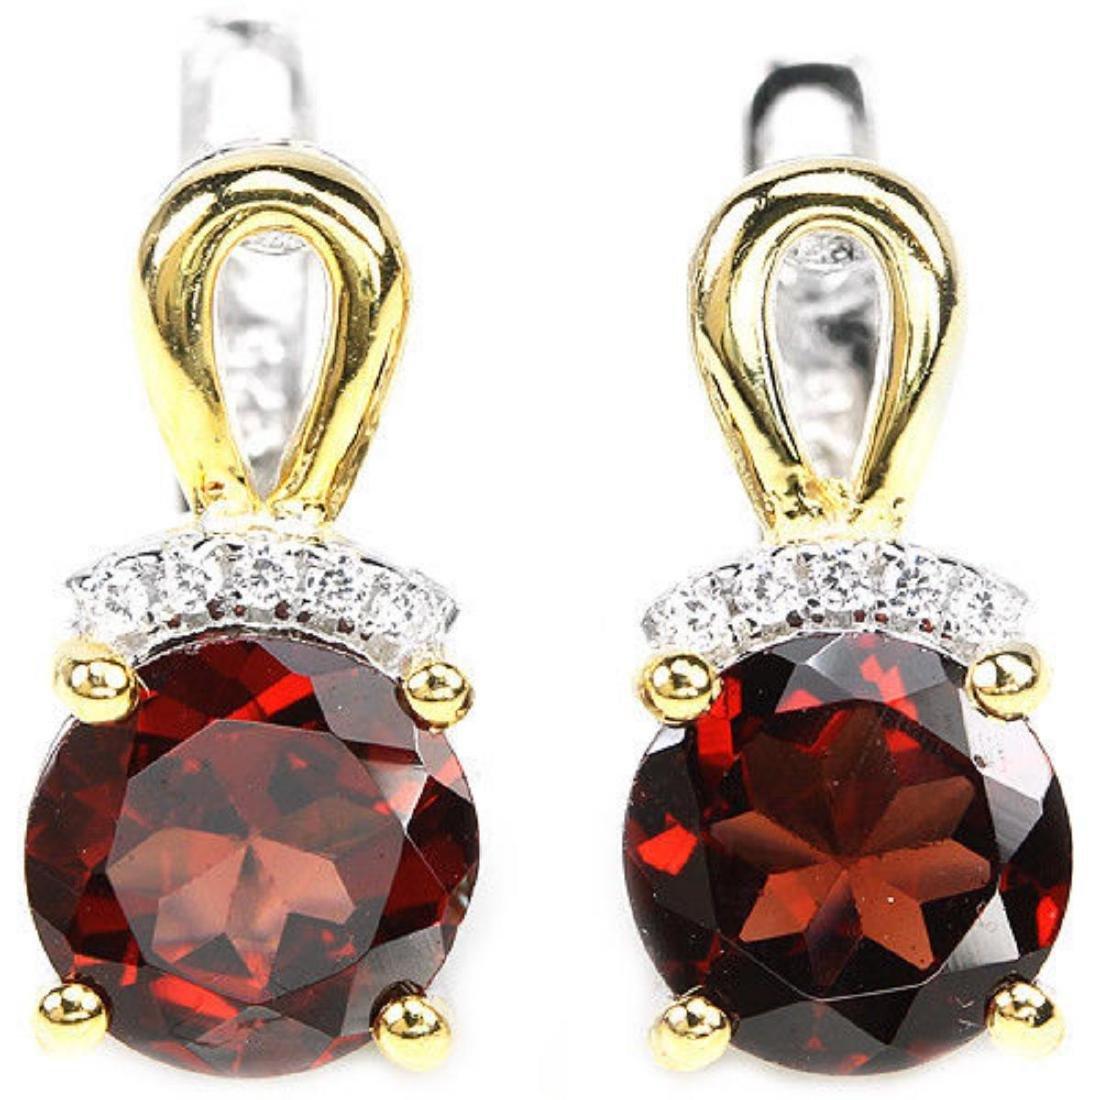 NATURAL DARK RED GARNET Earrings